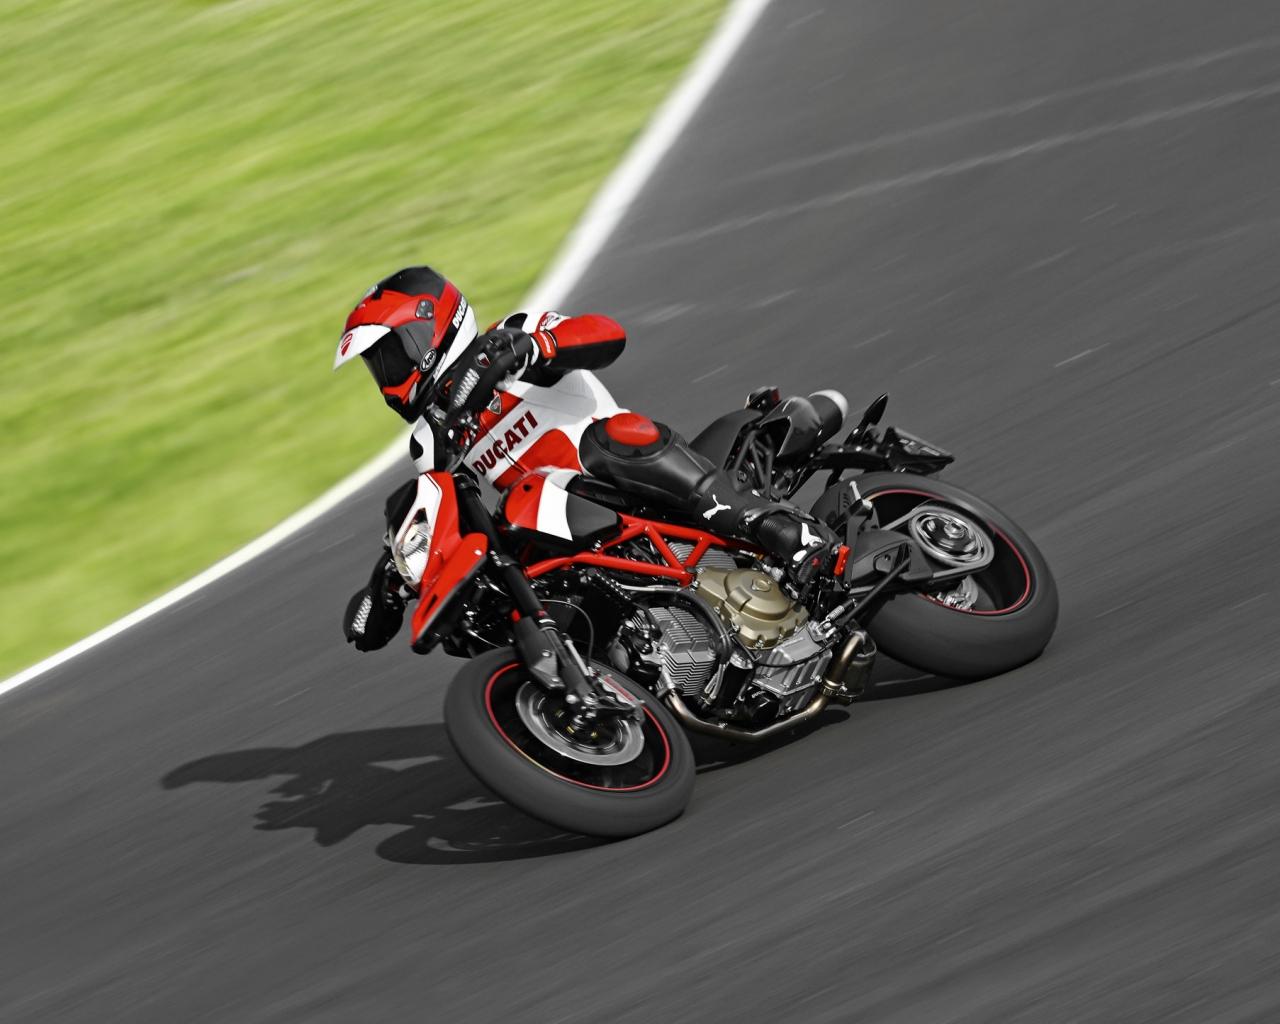 Ducati Hypermotard 1100 EVO - 1280x1024